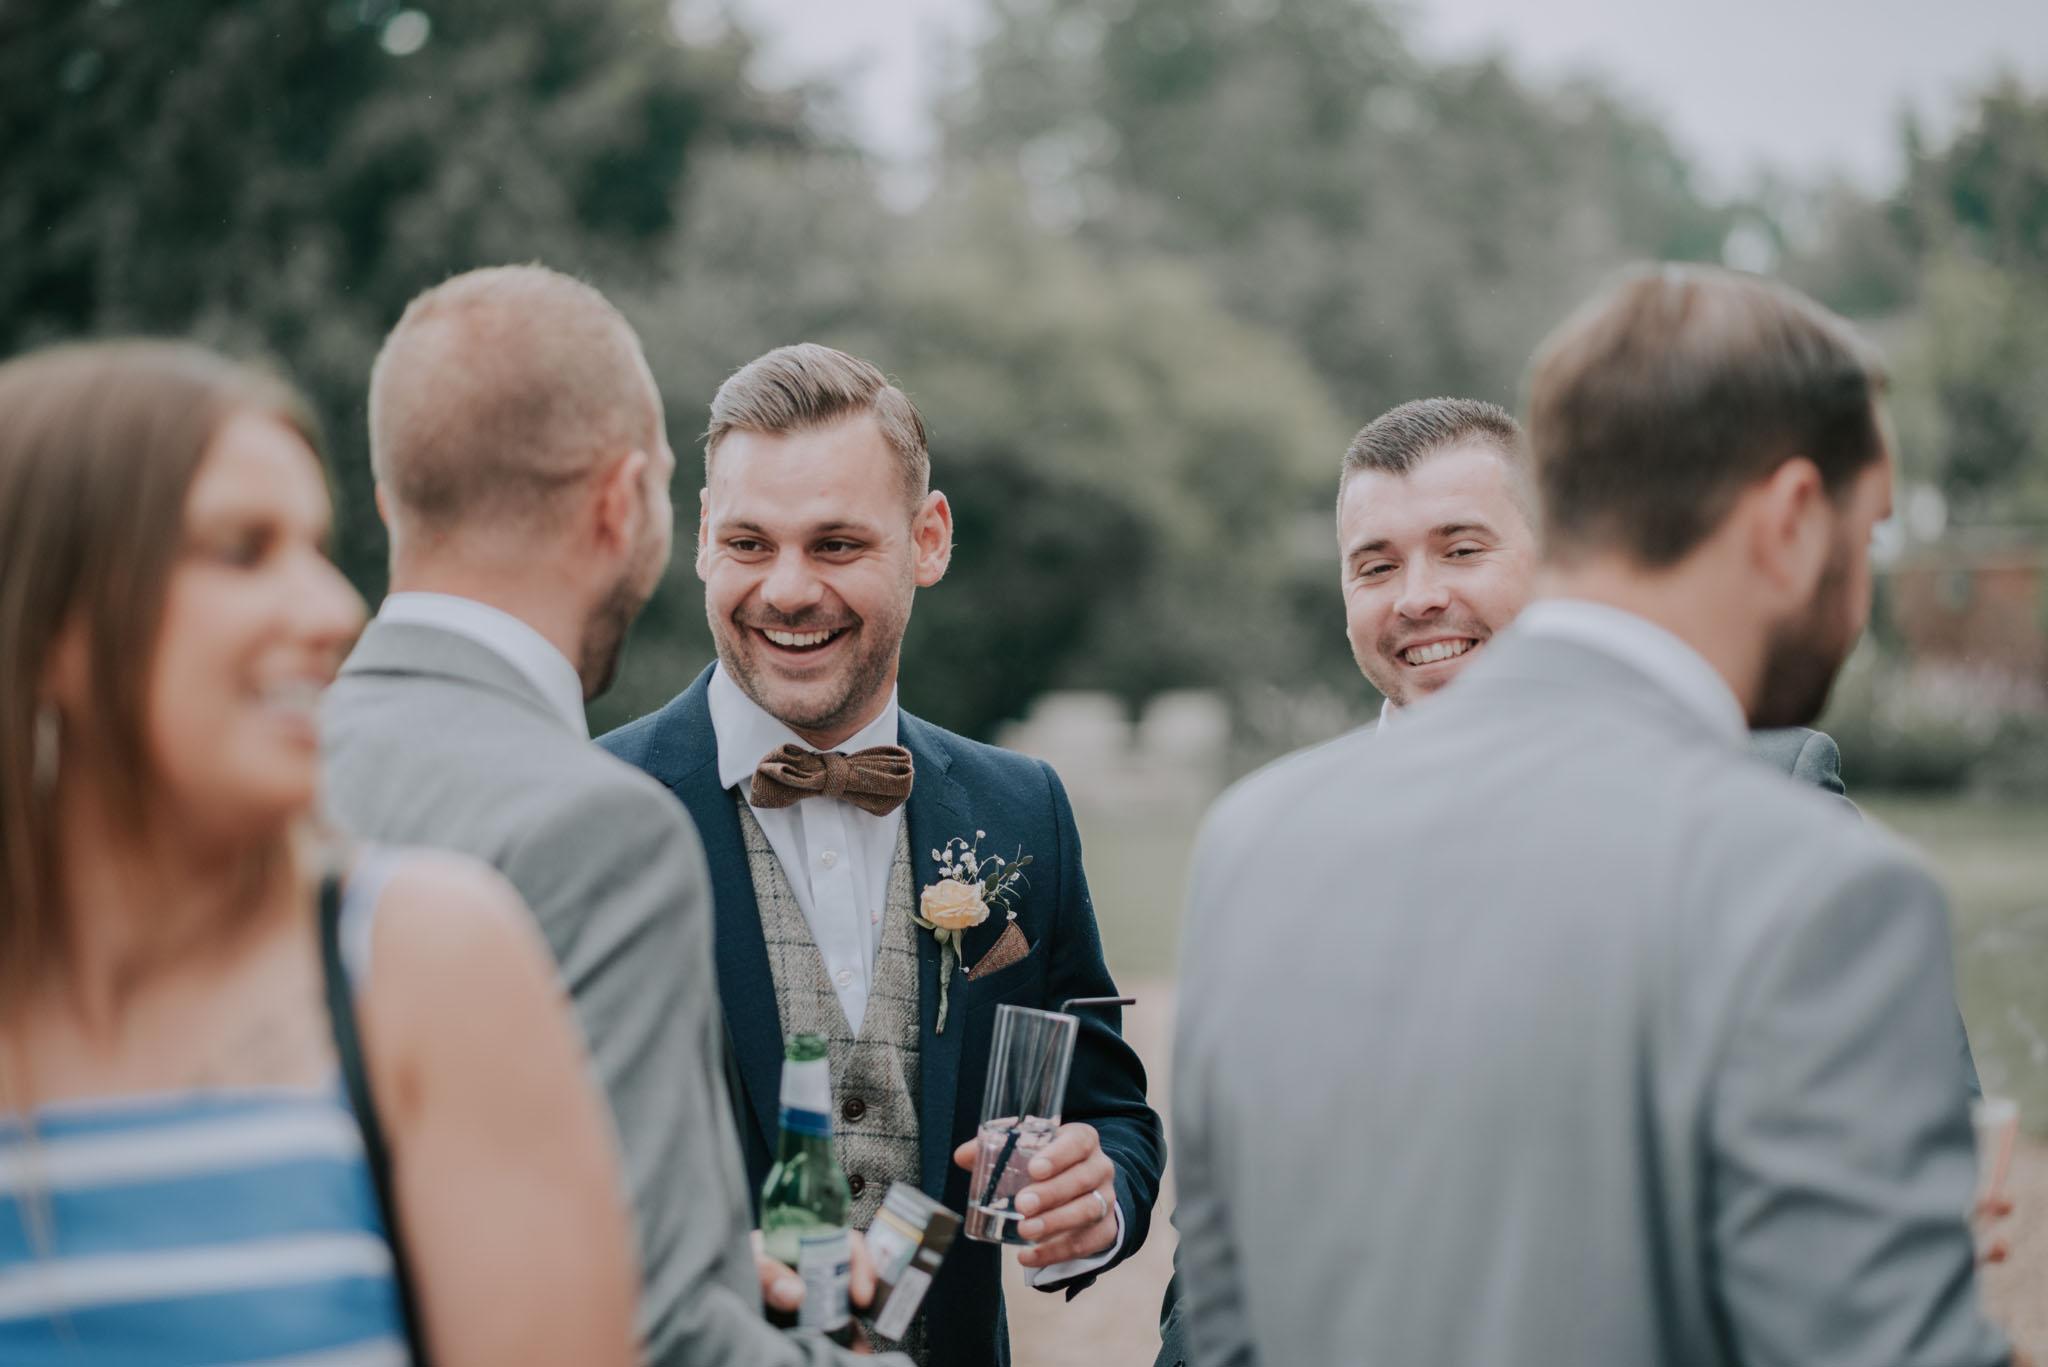 wedding-photographer-glewstone-court-hereford-scott-stockwell-photography362.jpg